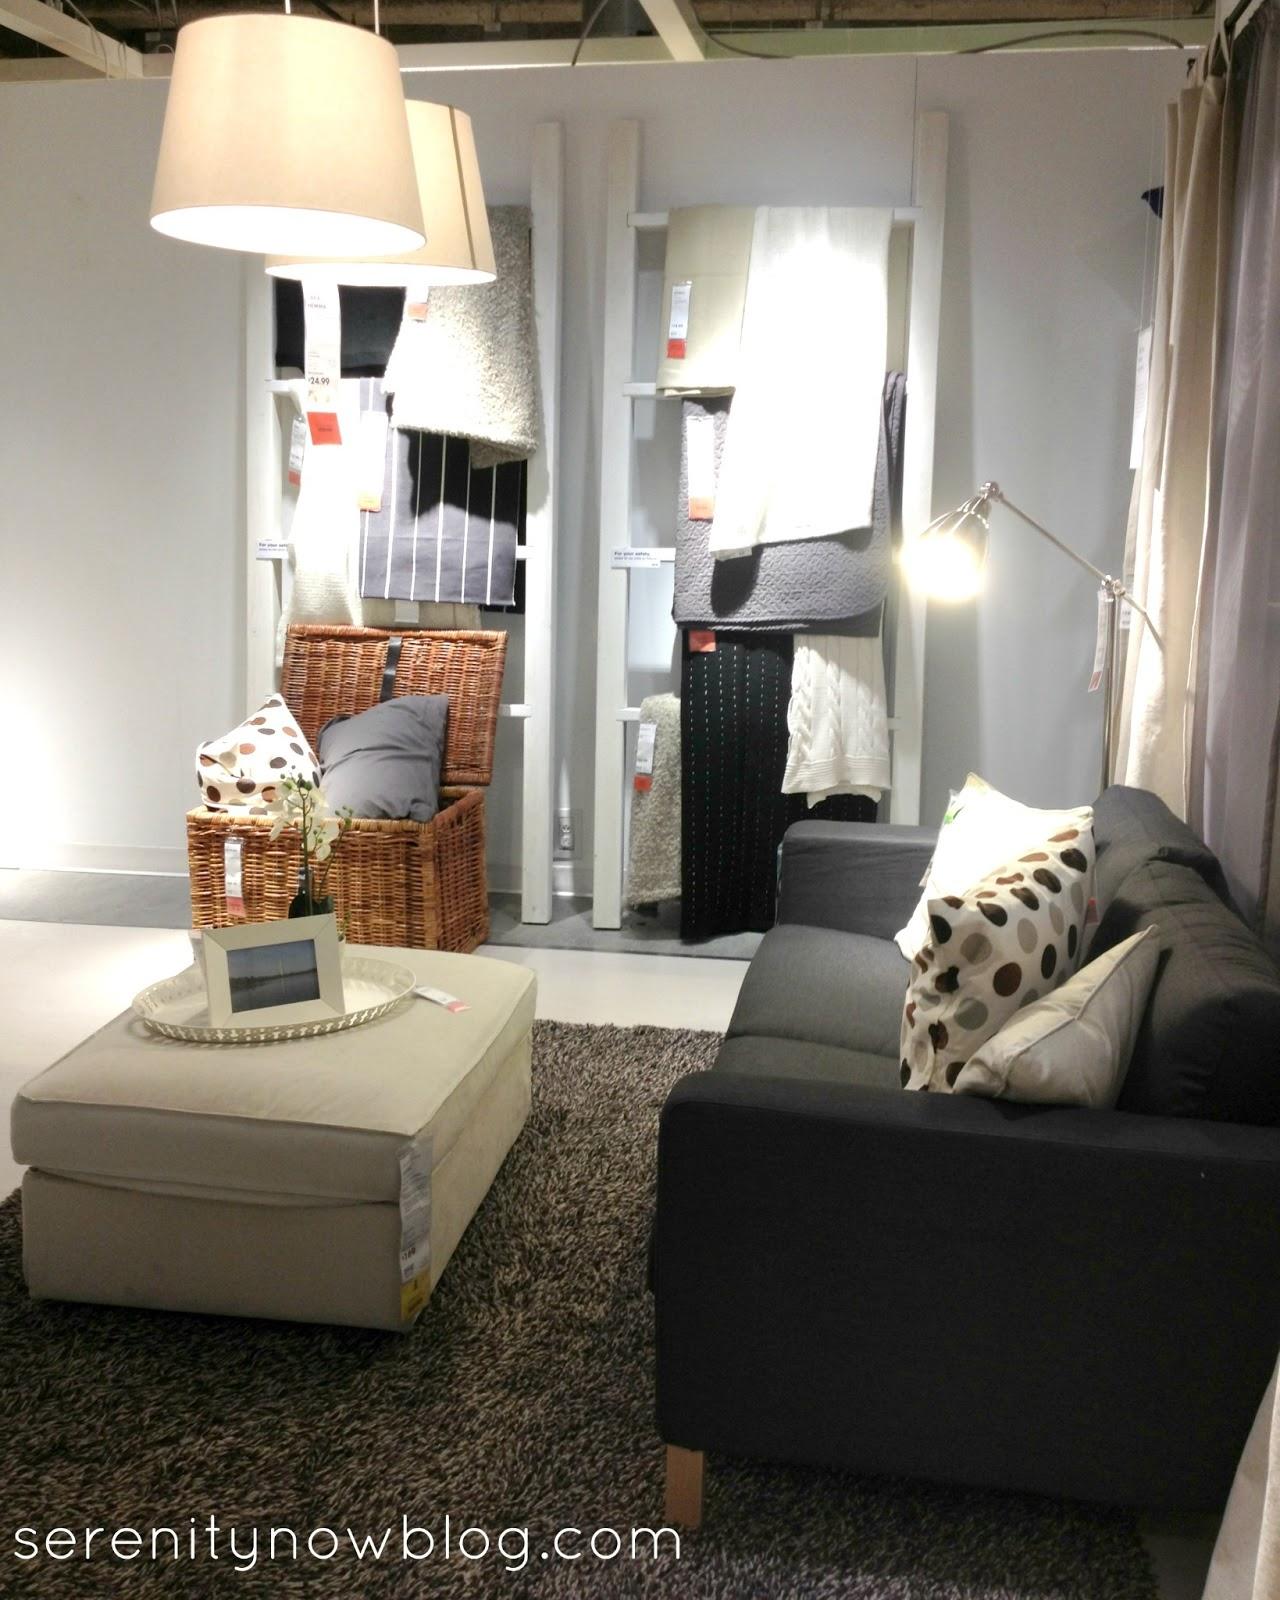 ikea living room family room decorating ideas serenity now blog